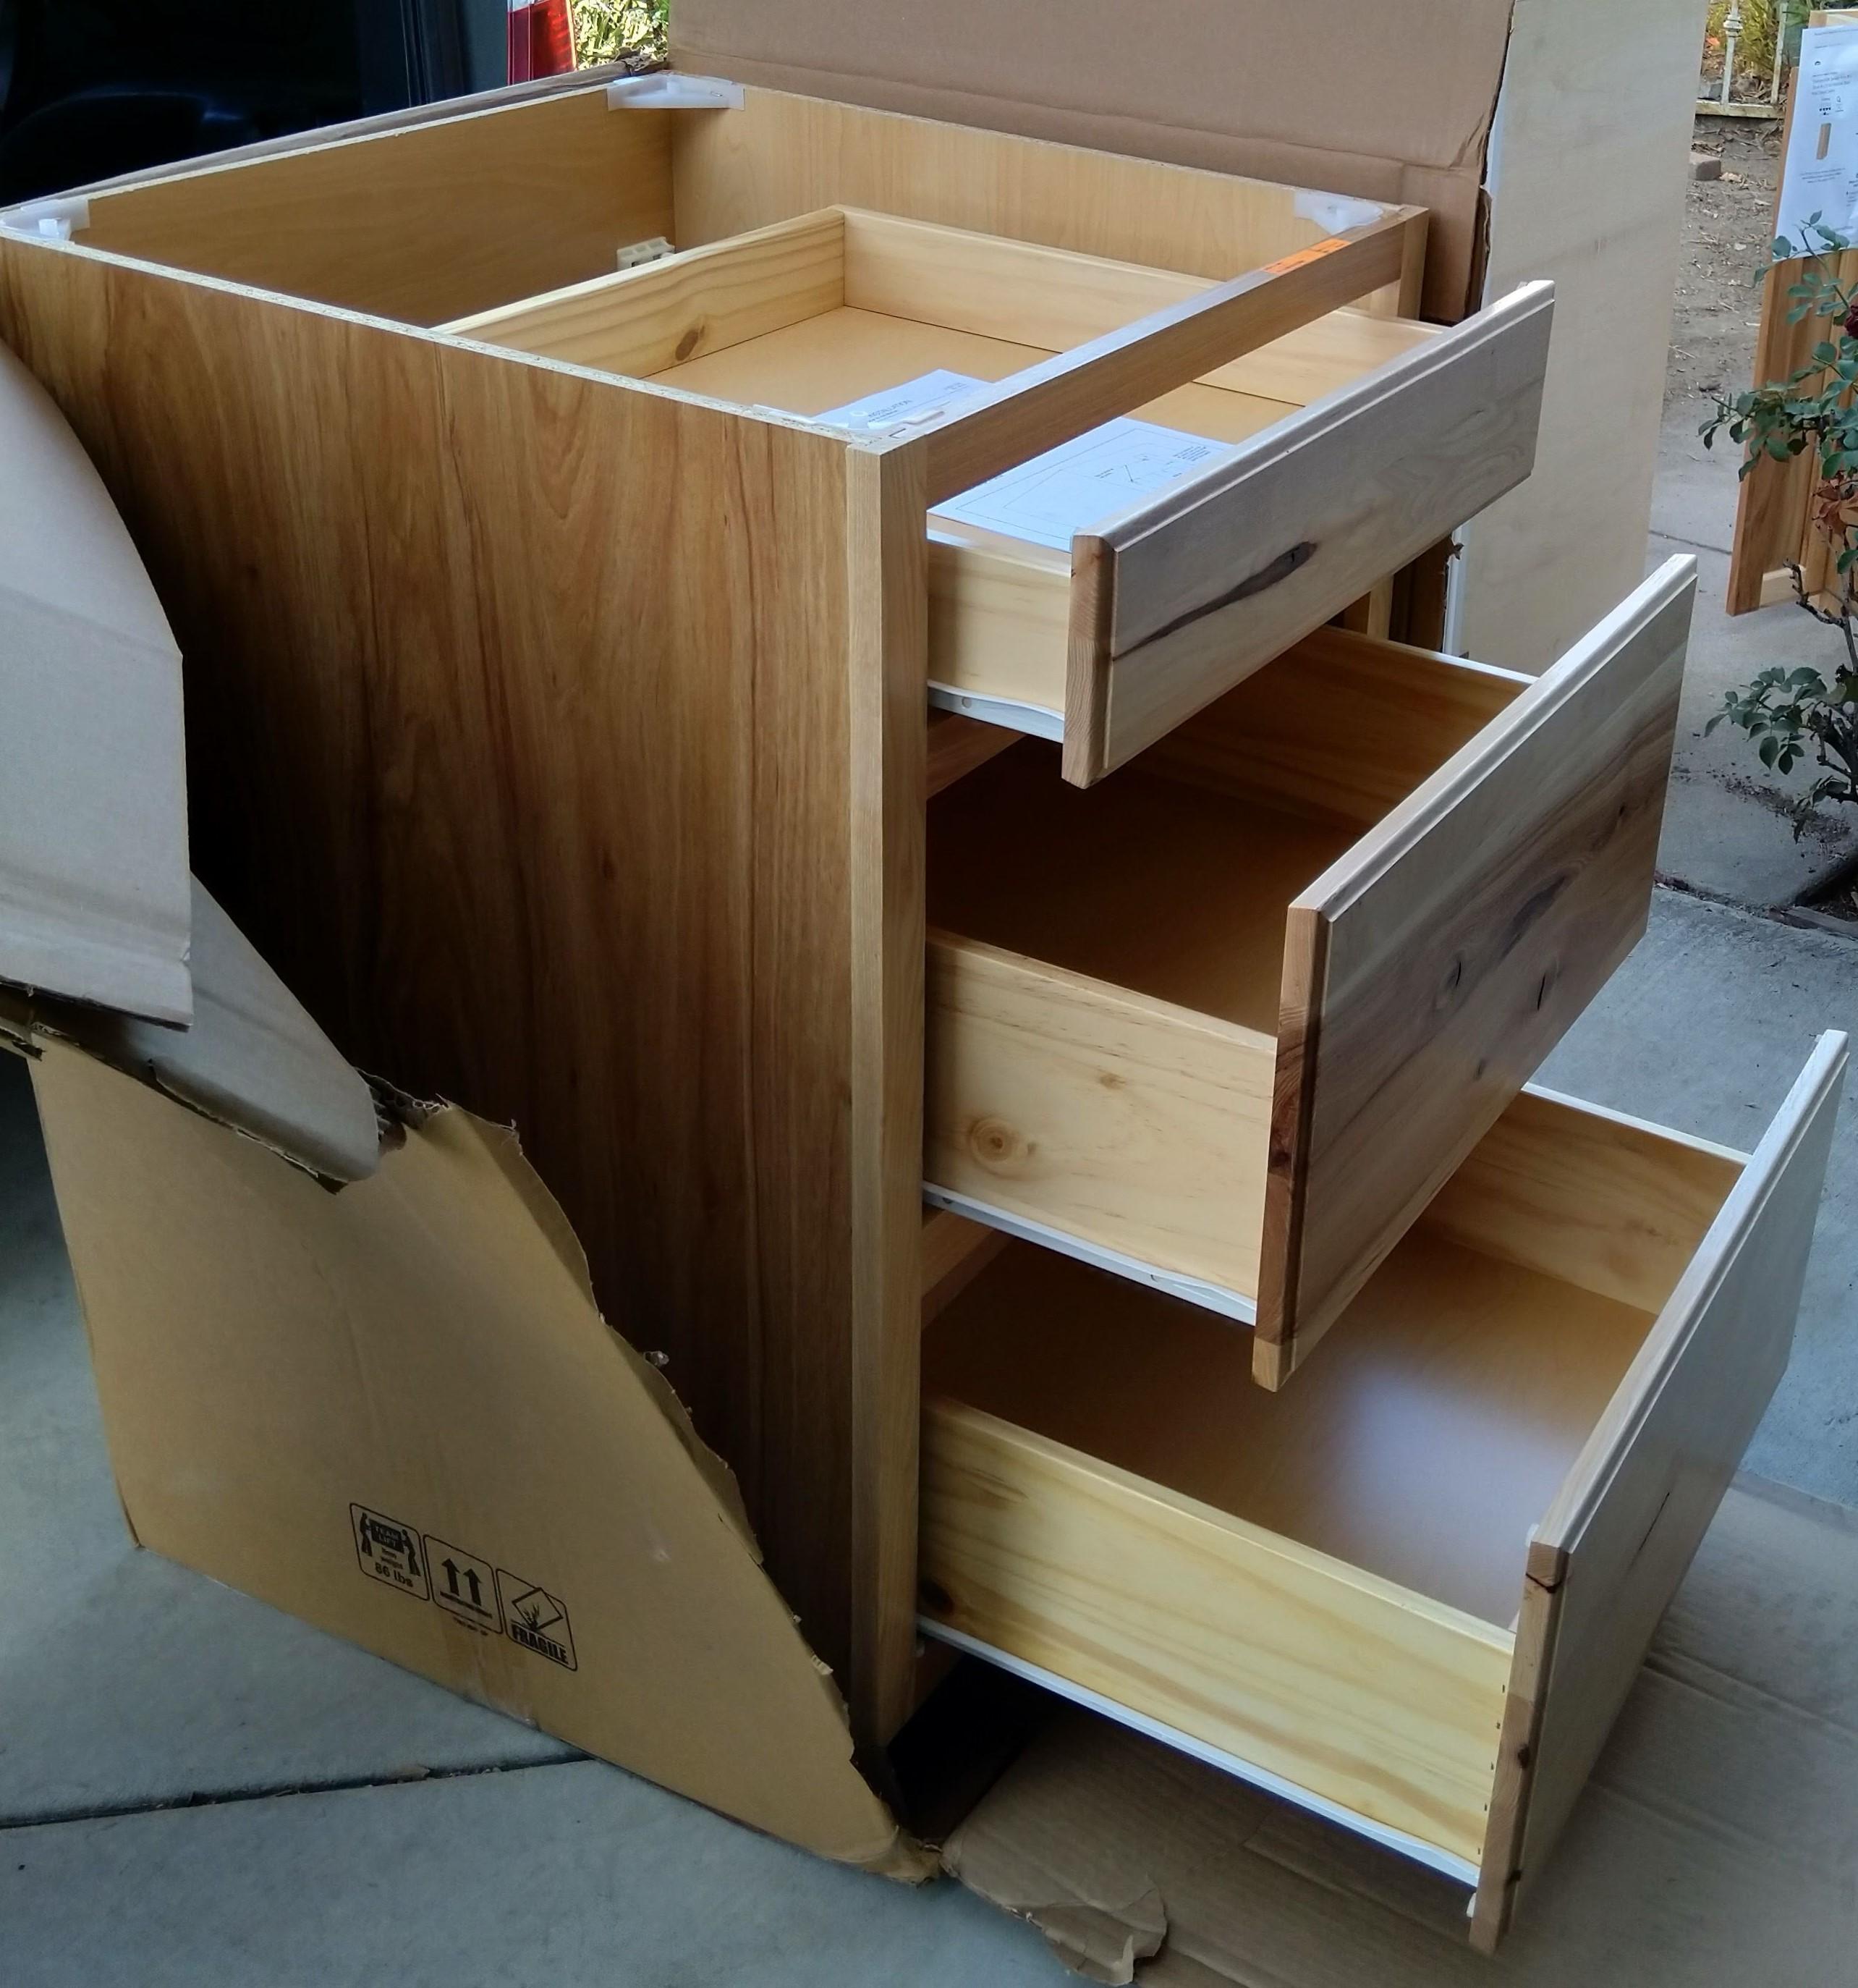 NIB Kitchen Base Stock Cabinet, model 22 B24R | DiggersList